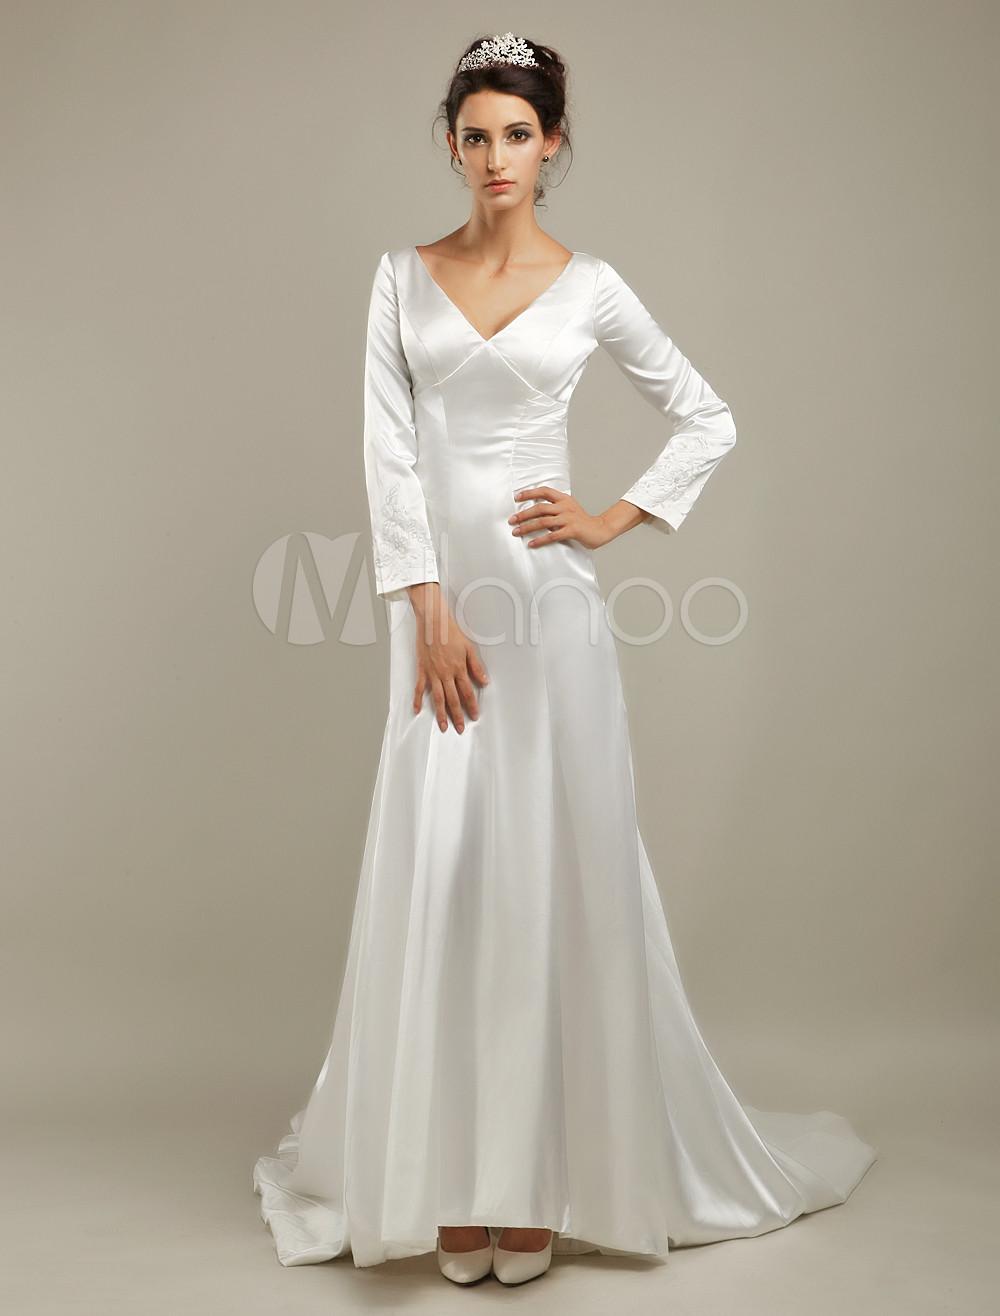 Court Train Ivory Bridal Wedding Dress with V-Neck A-line ...